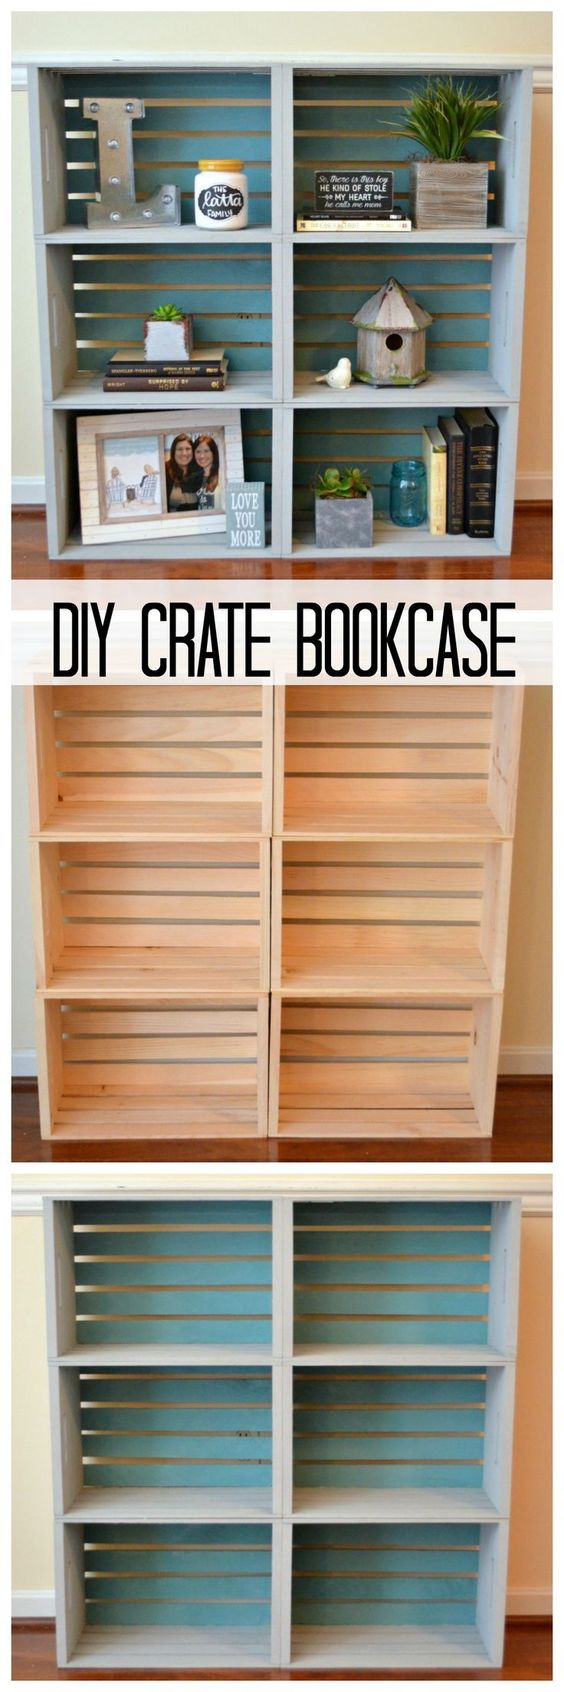 DIY Crate Bookcase.